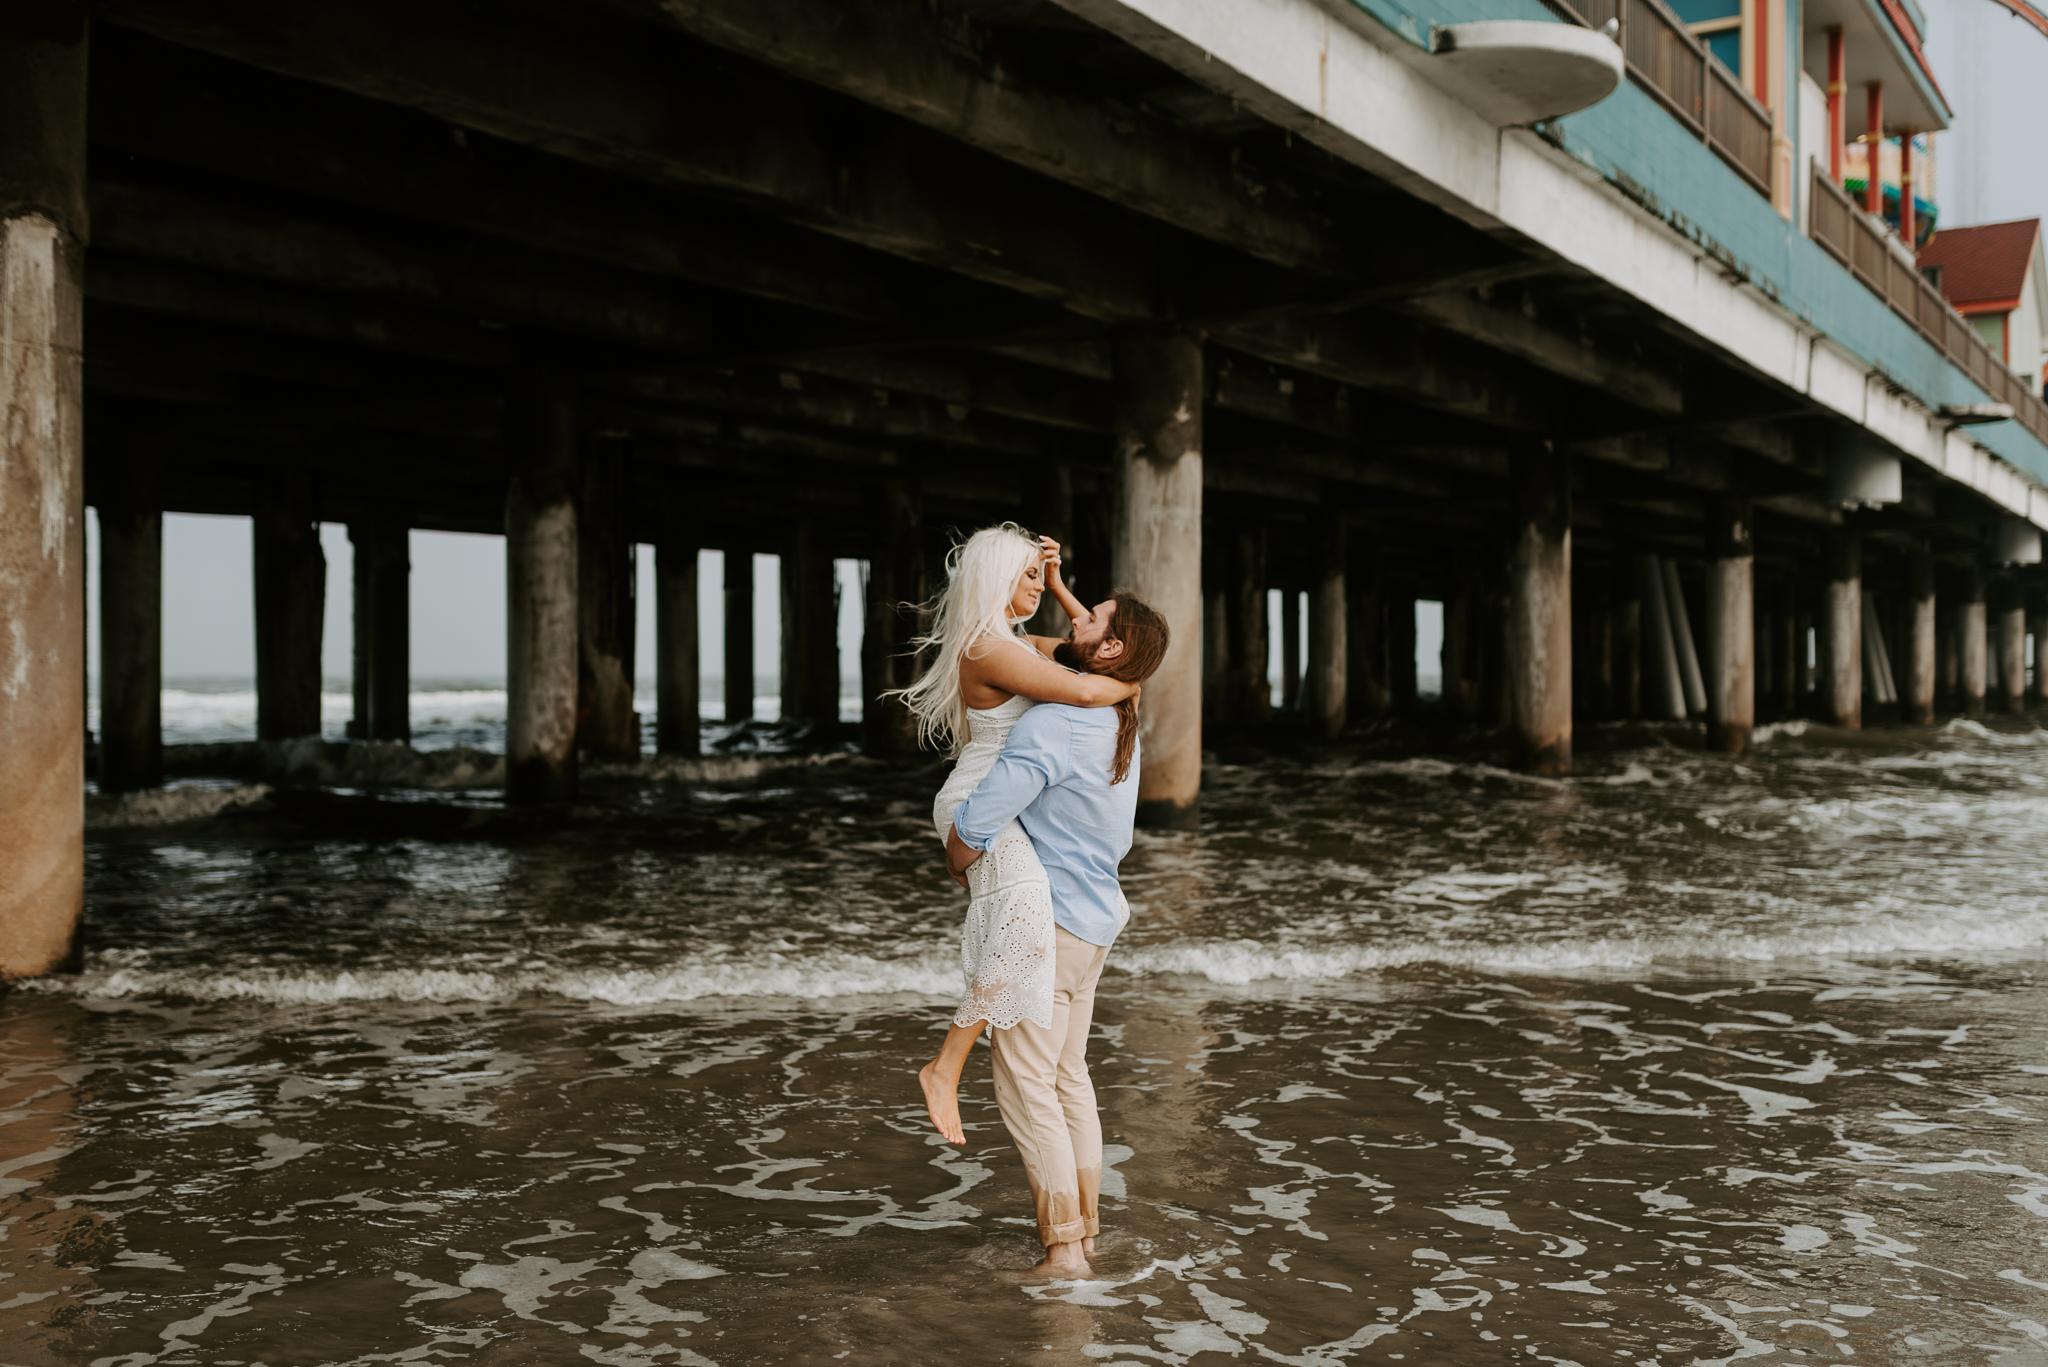 Ashley + Charles - Galveston Texas Moody Engagement Session | Kristen Giles Photography - 021.jpg